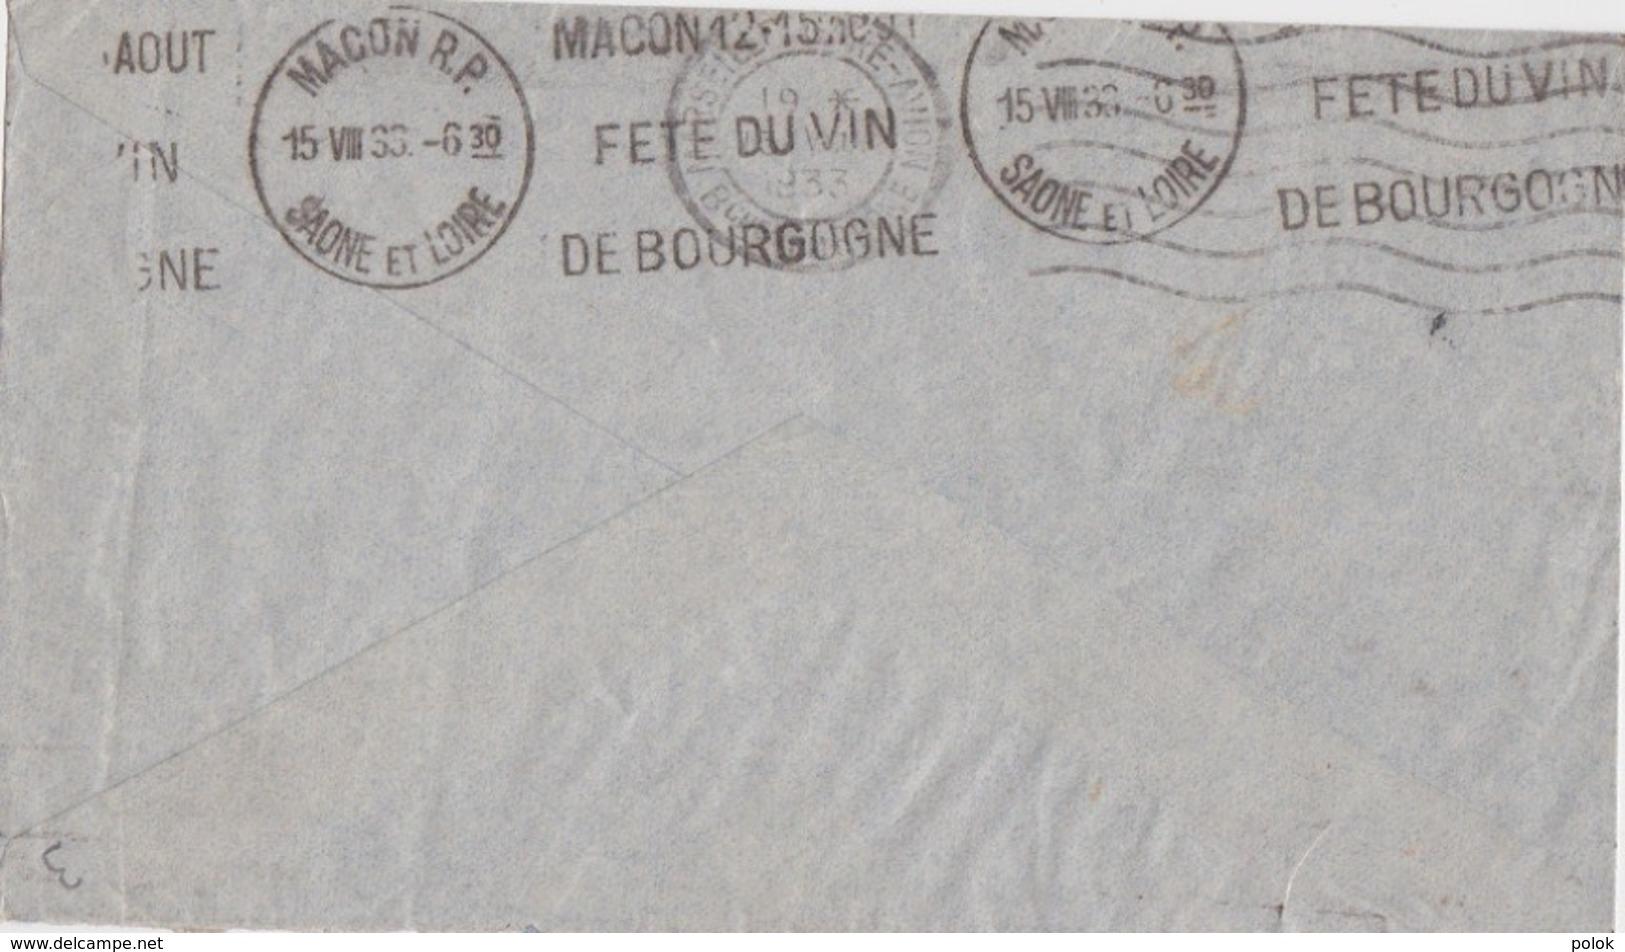 Lettre Indochine à France - Cachet Nha Trang, Annam 1933 - Par Avion, Via Air Orient - Indochina (1889-1945)